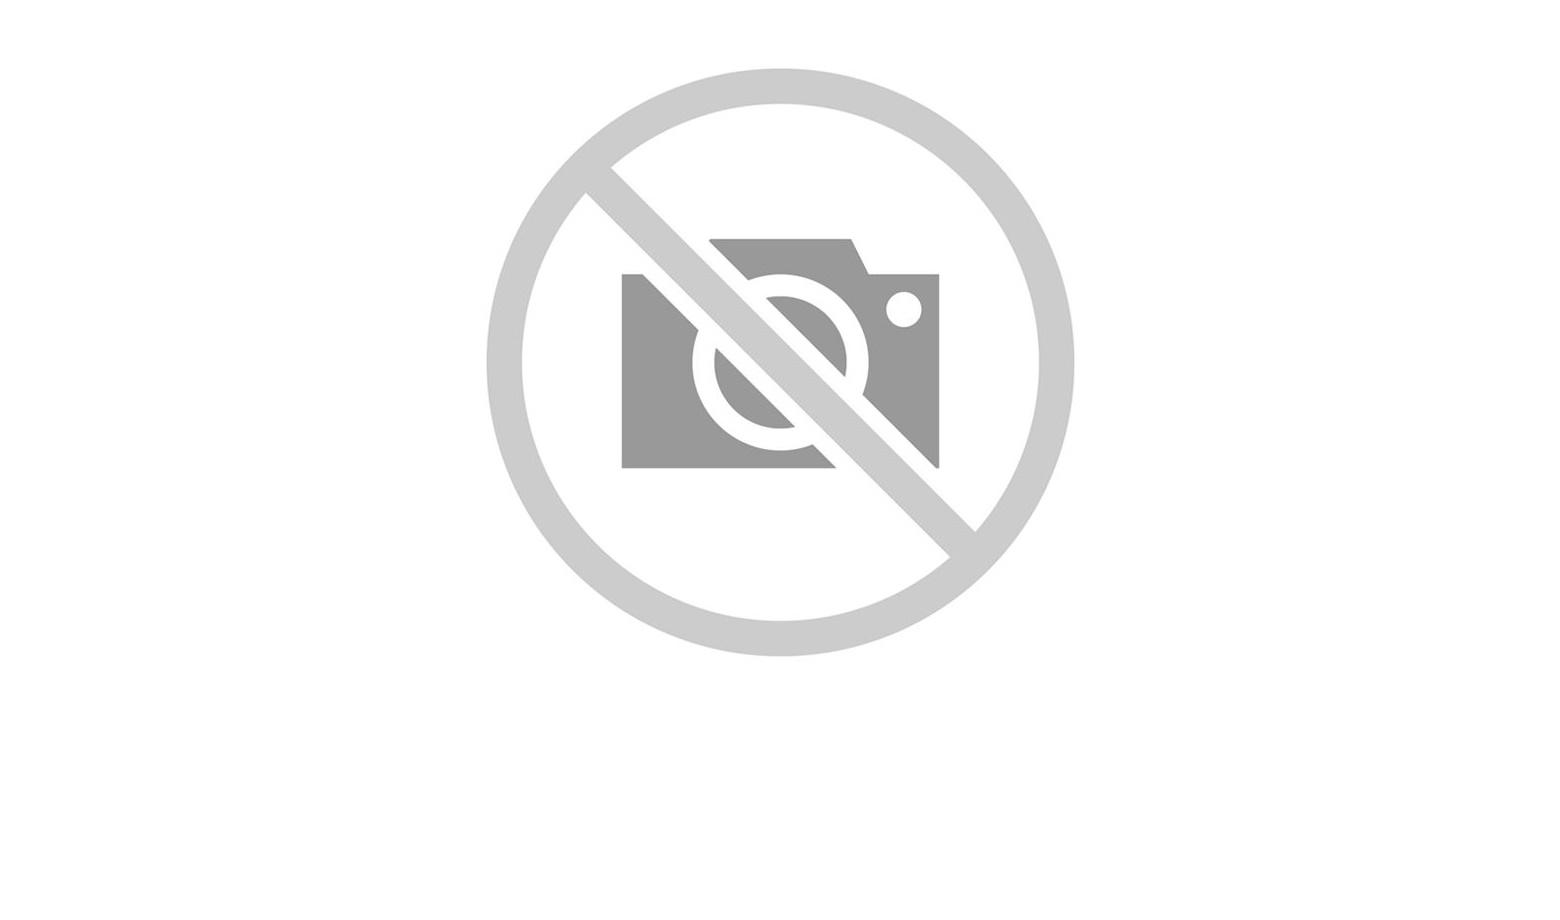 BASLIK+AYAKUCU HIPERIA PLUS 160x200 GRI (M0018)